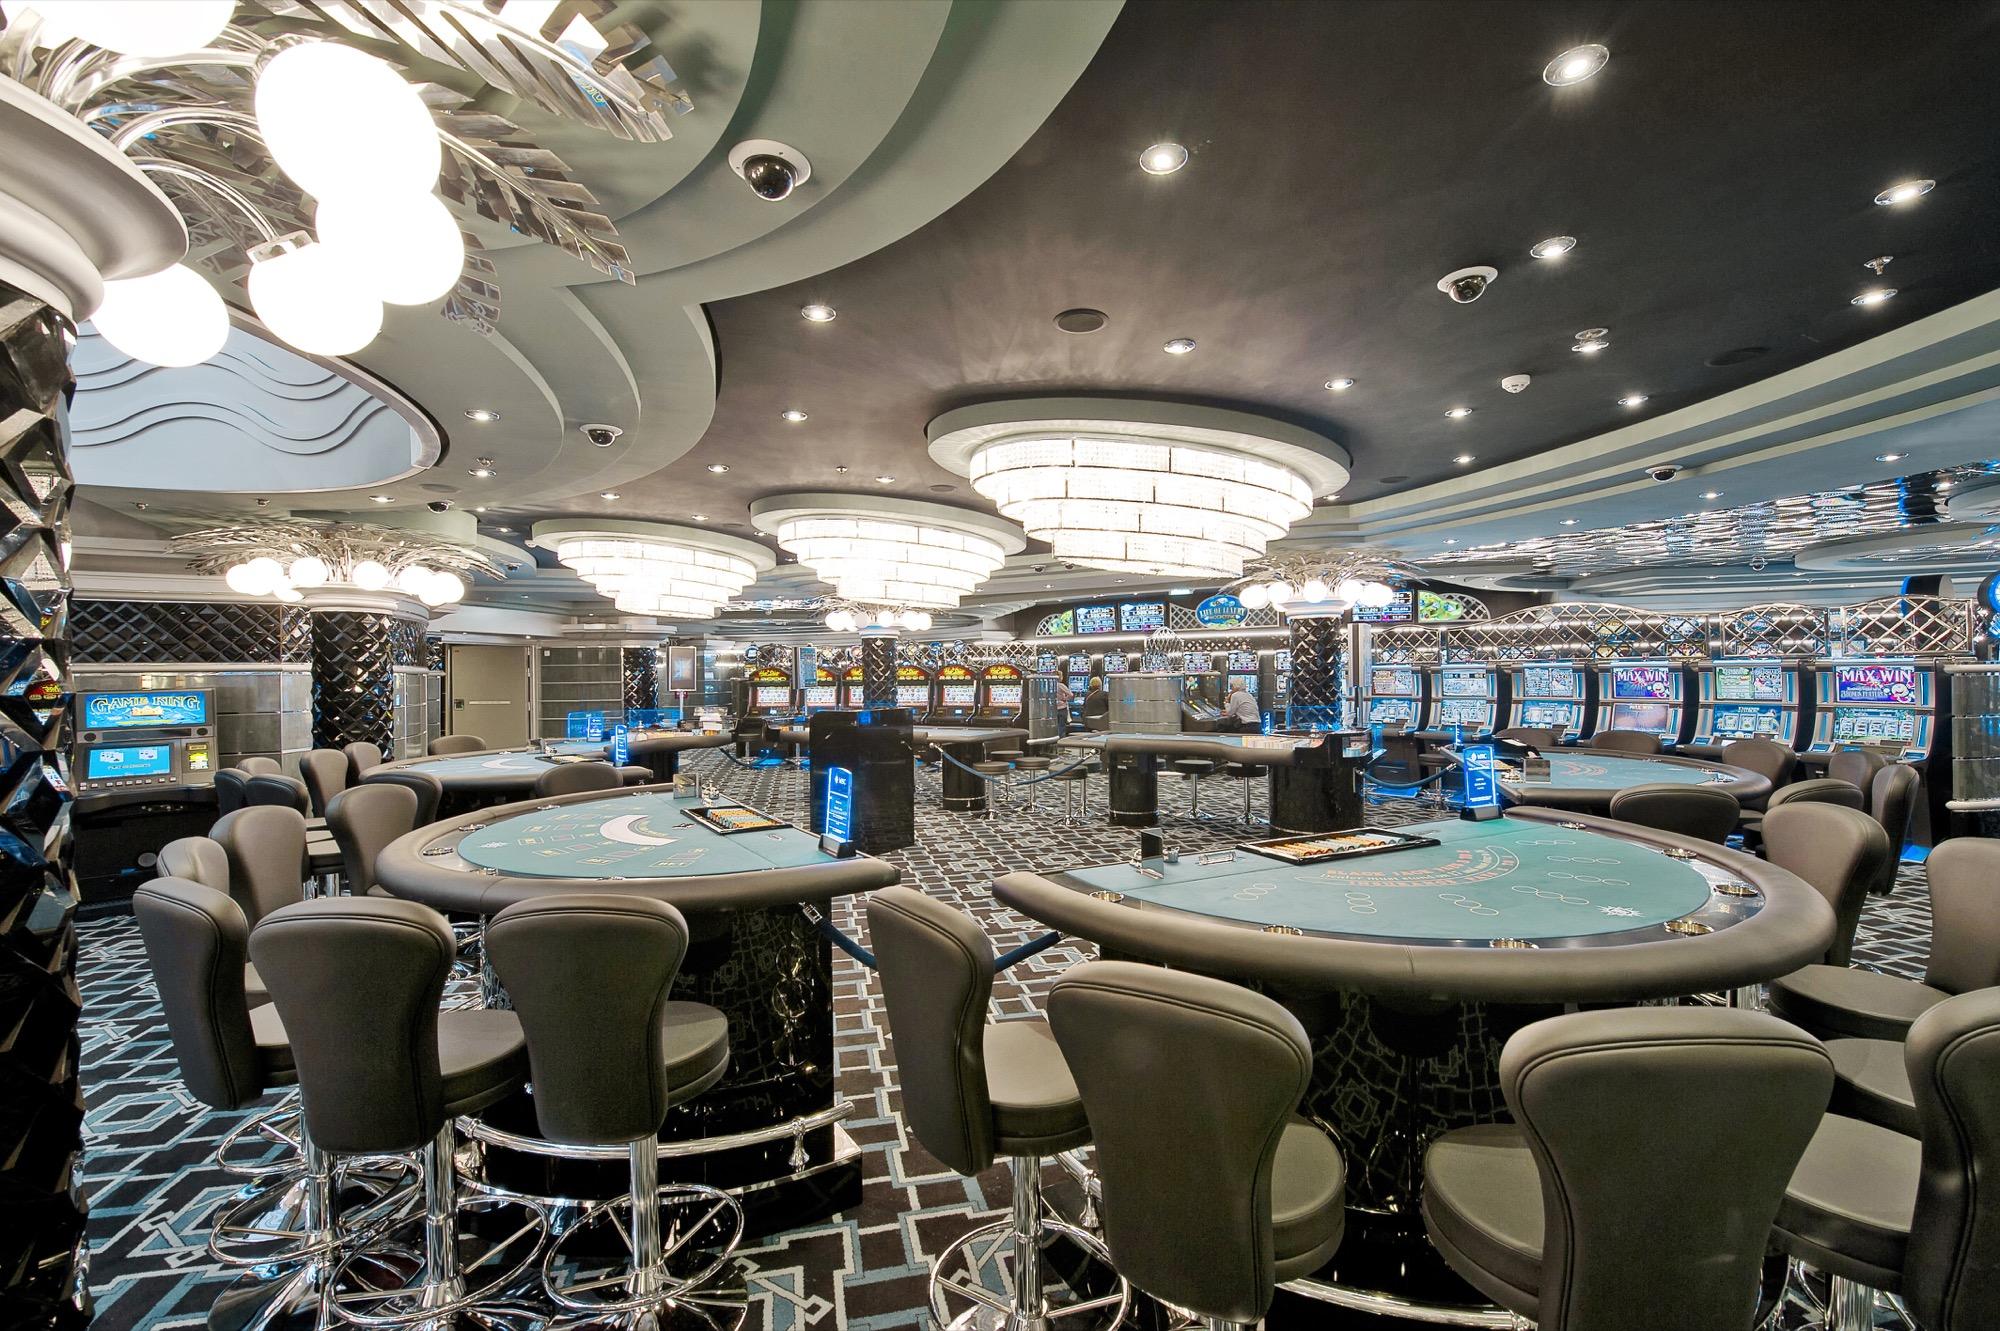 MSC Fantasia Class casino 2.jpg